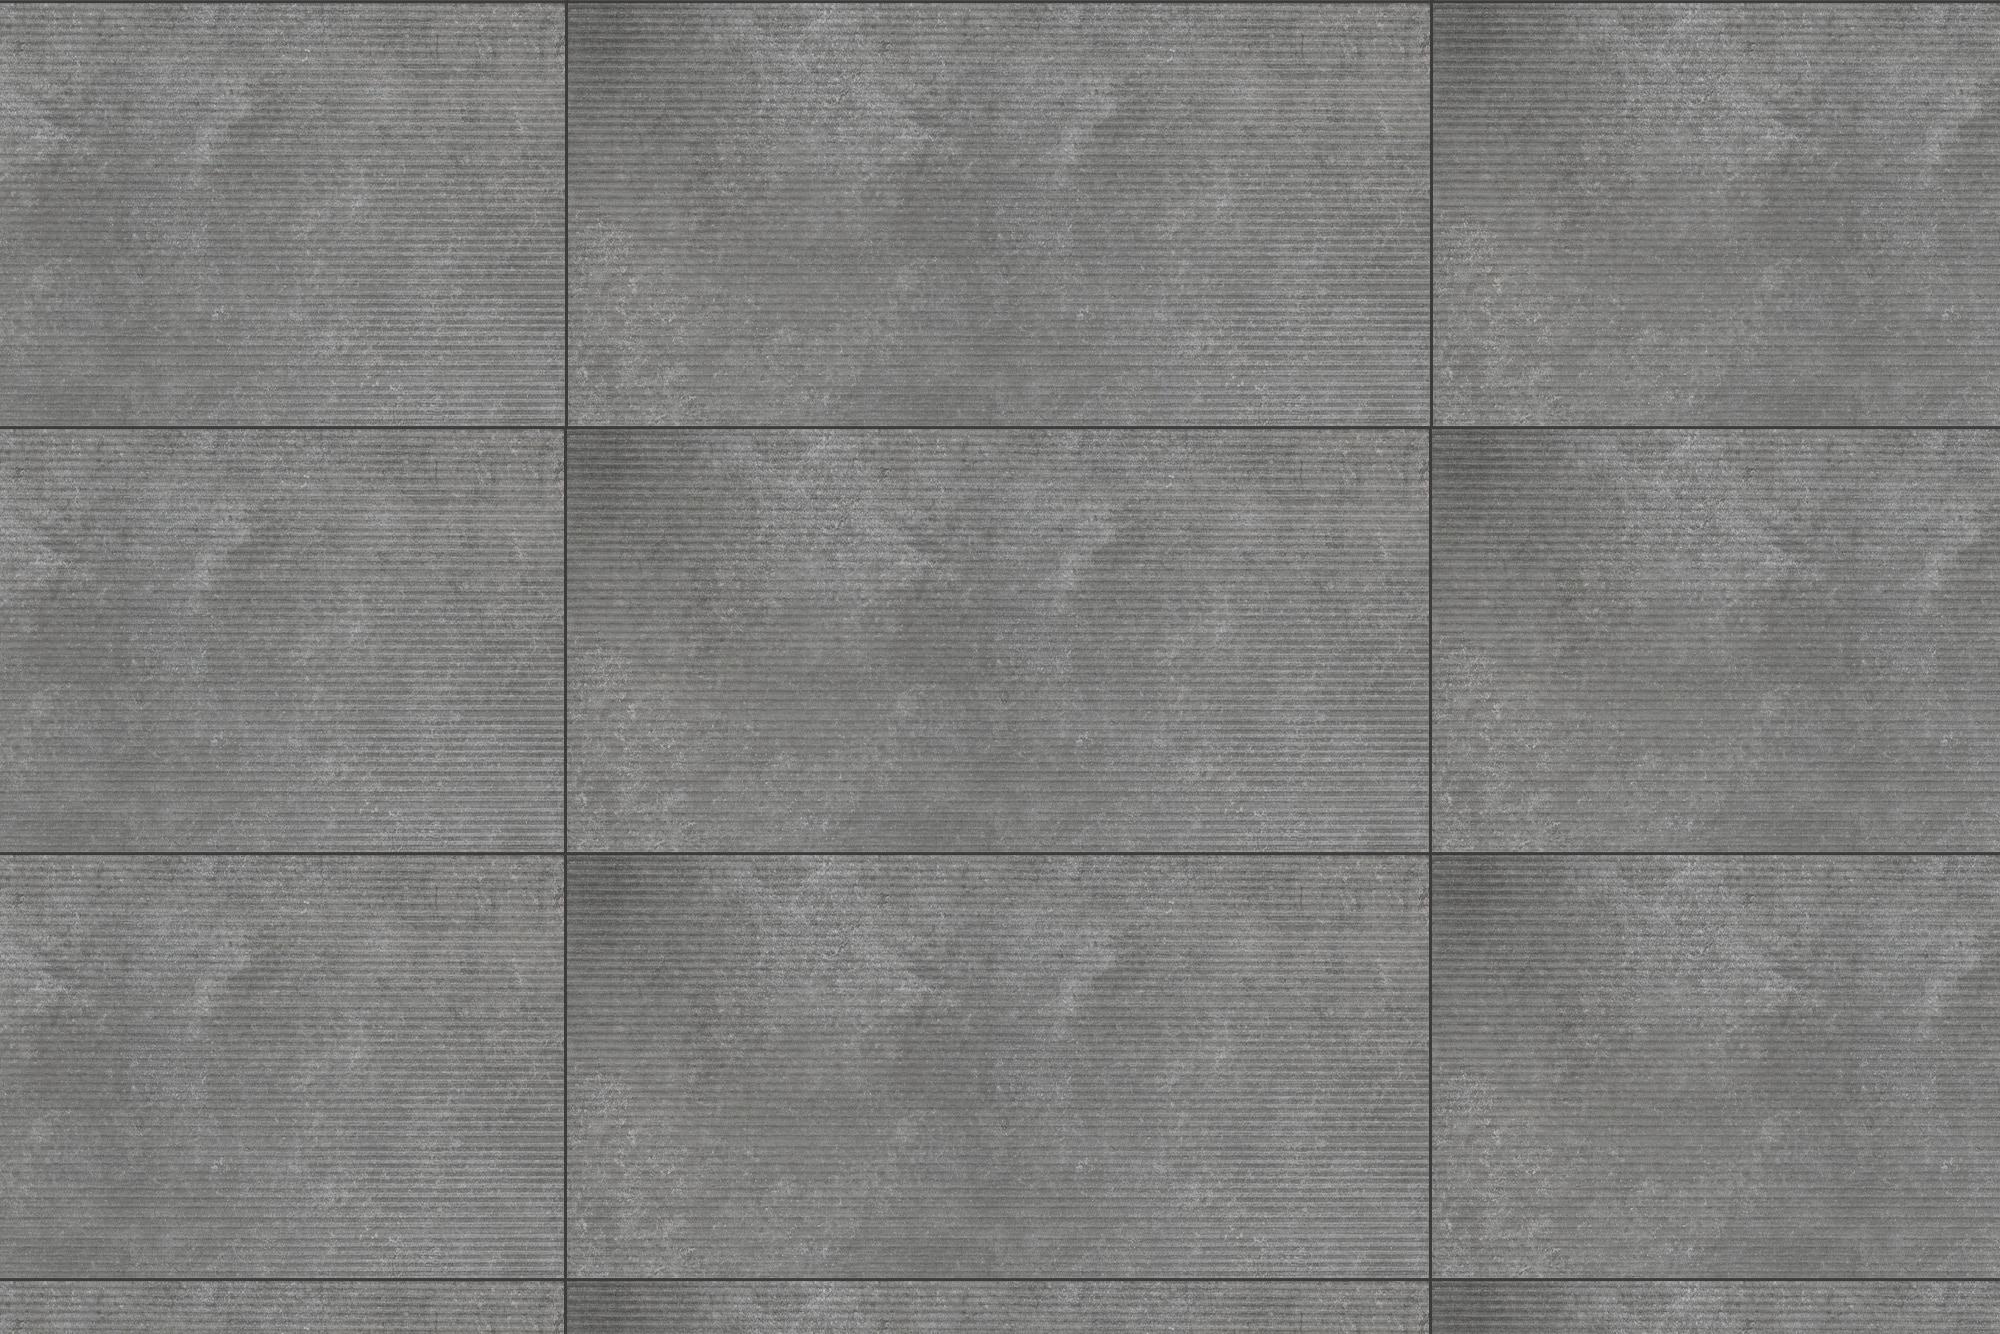 Black / 12x24 / Structured Olympus - Phosphorous 0